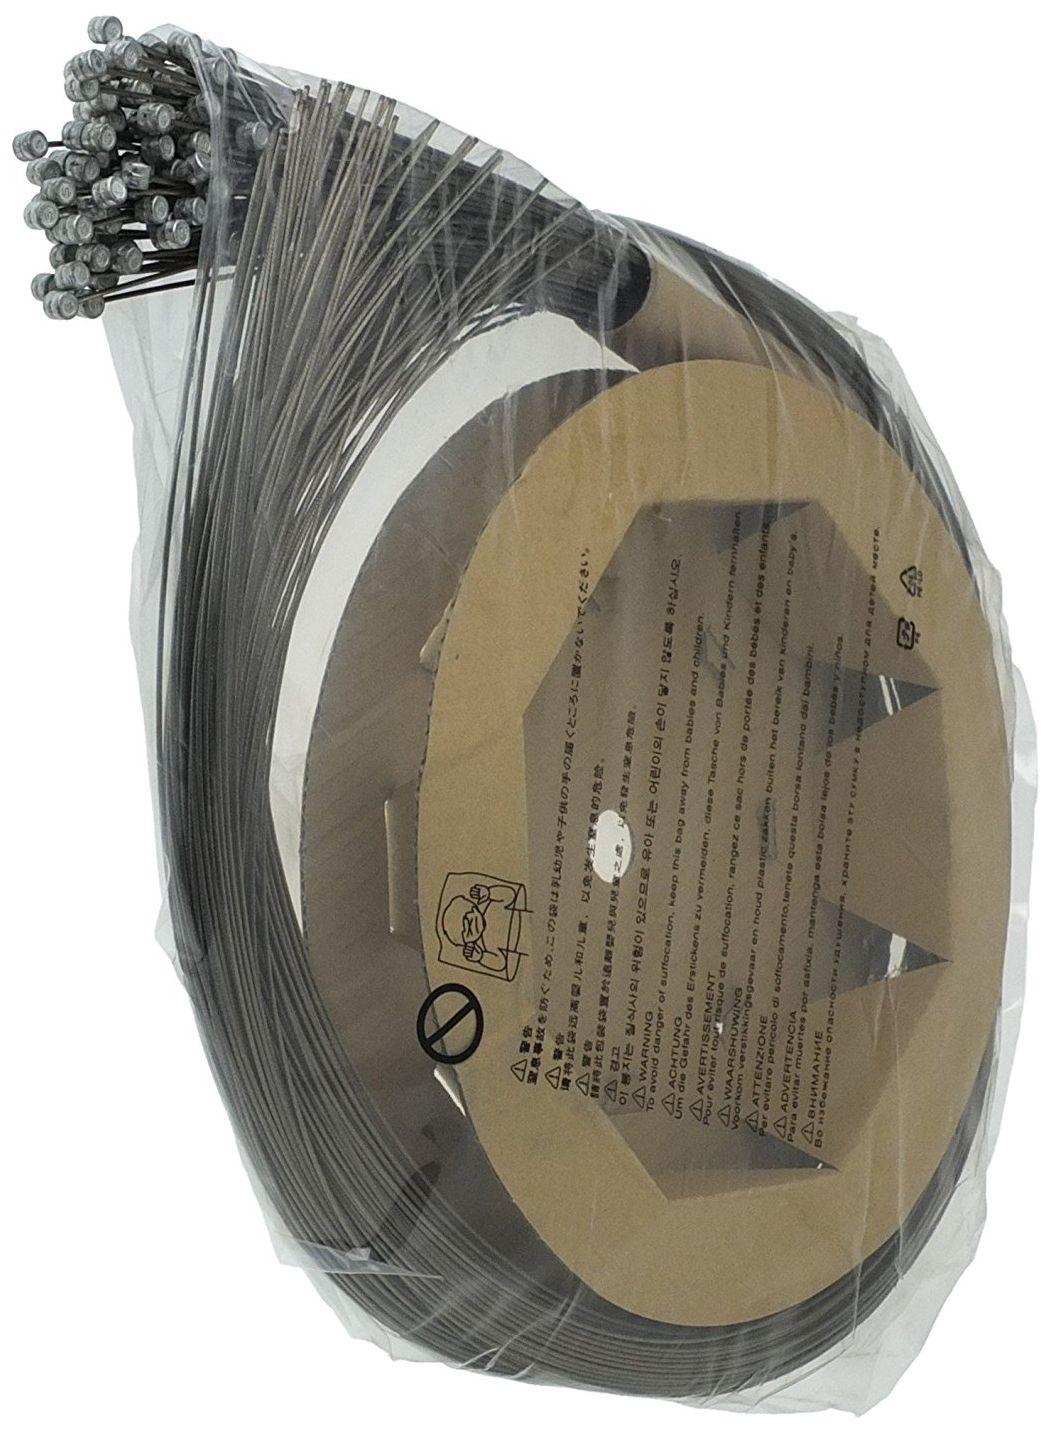 Запчасть Shimano трос тормозной Y80098551 (100шт),  тормоза и колодки  - артикул:287007